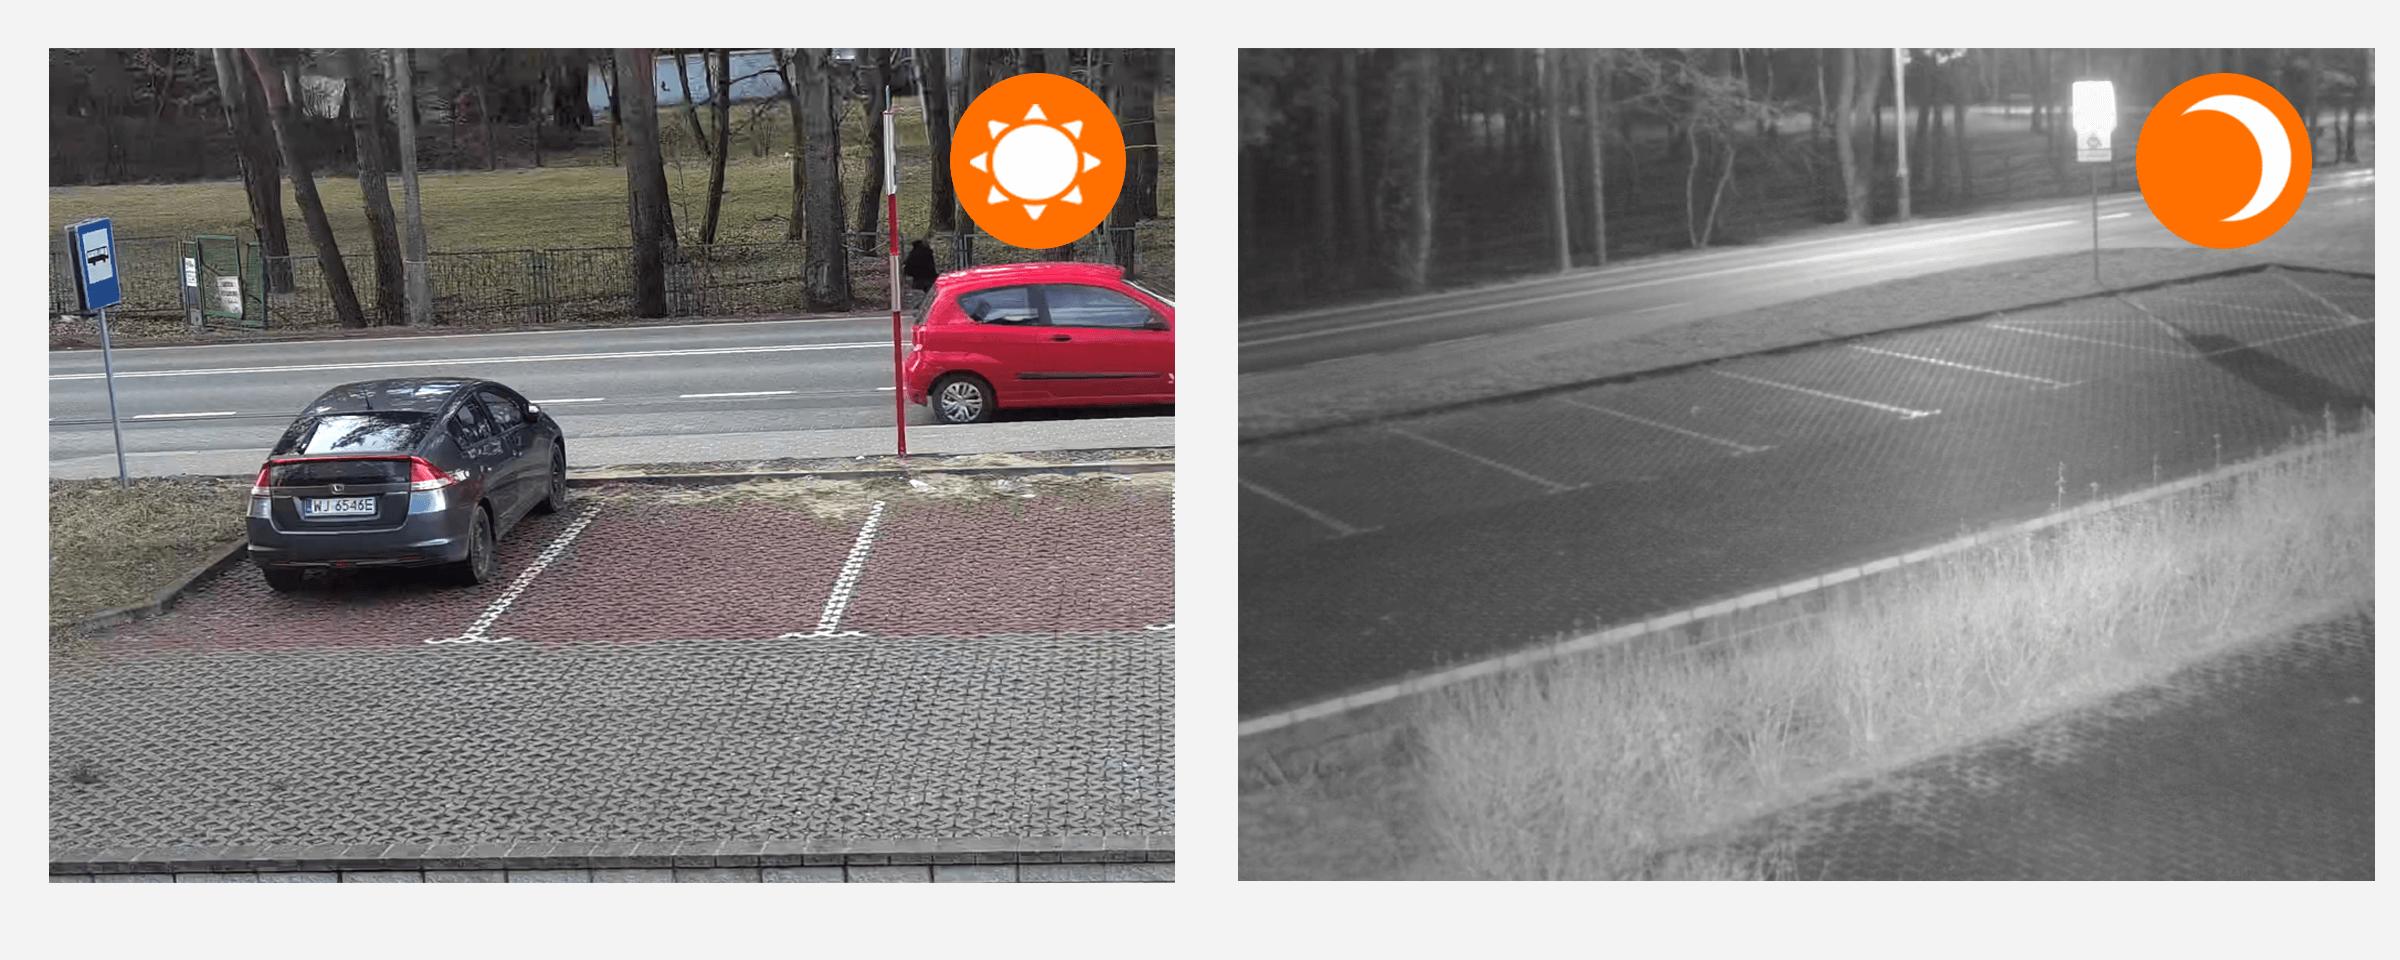 Kamera na podczerwień orllo.pl